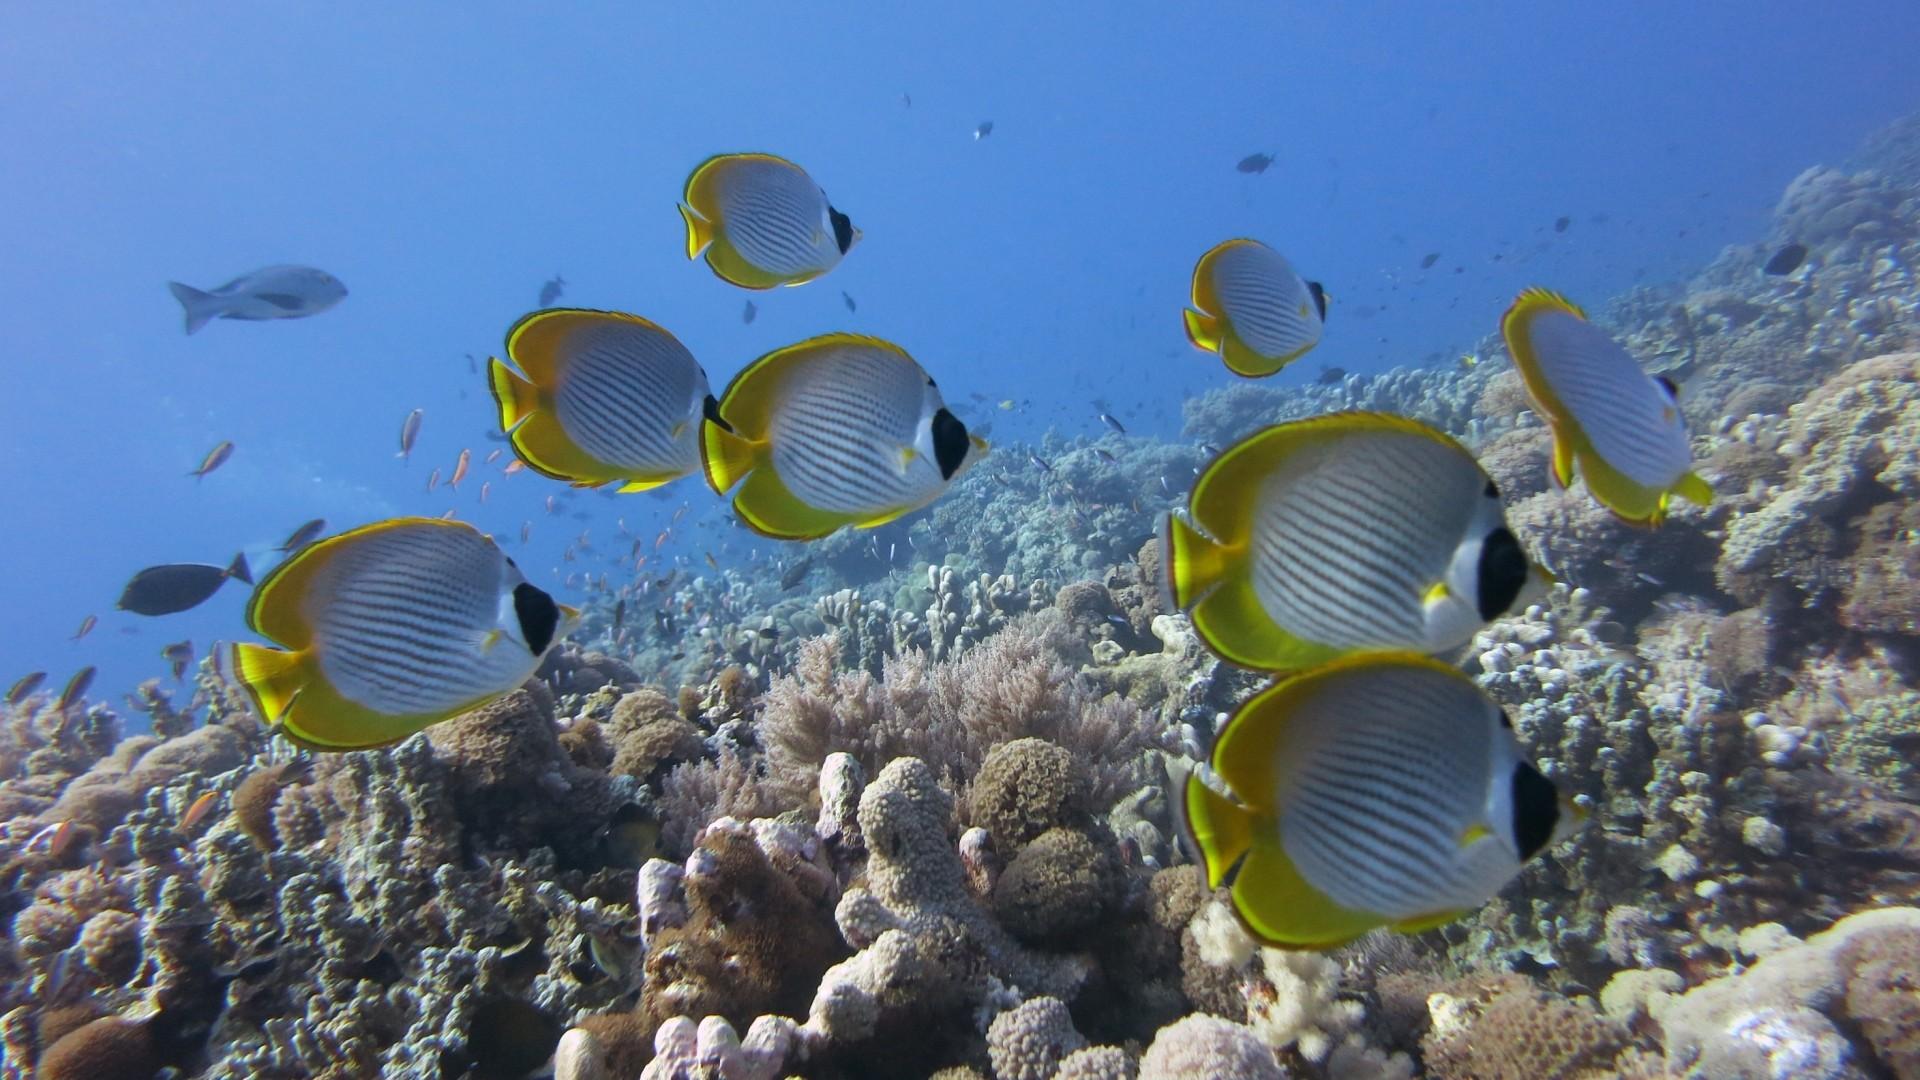 Tropical Ocean 3d Live Wallpaper Fish Wallpaper And Screensavers 58 Images